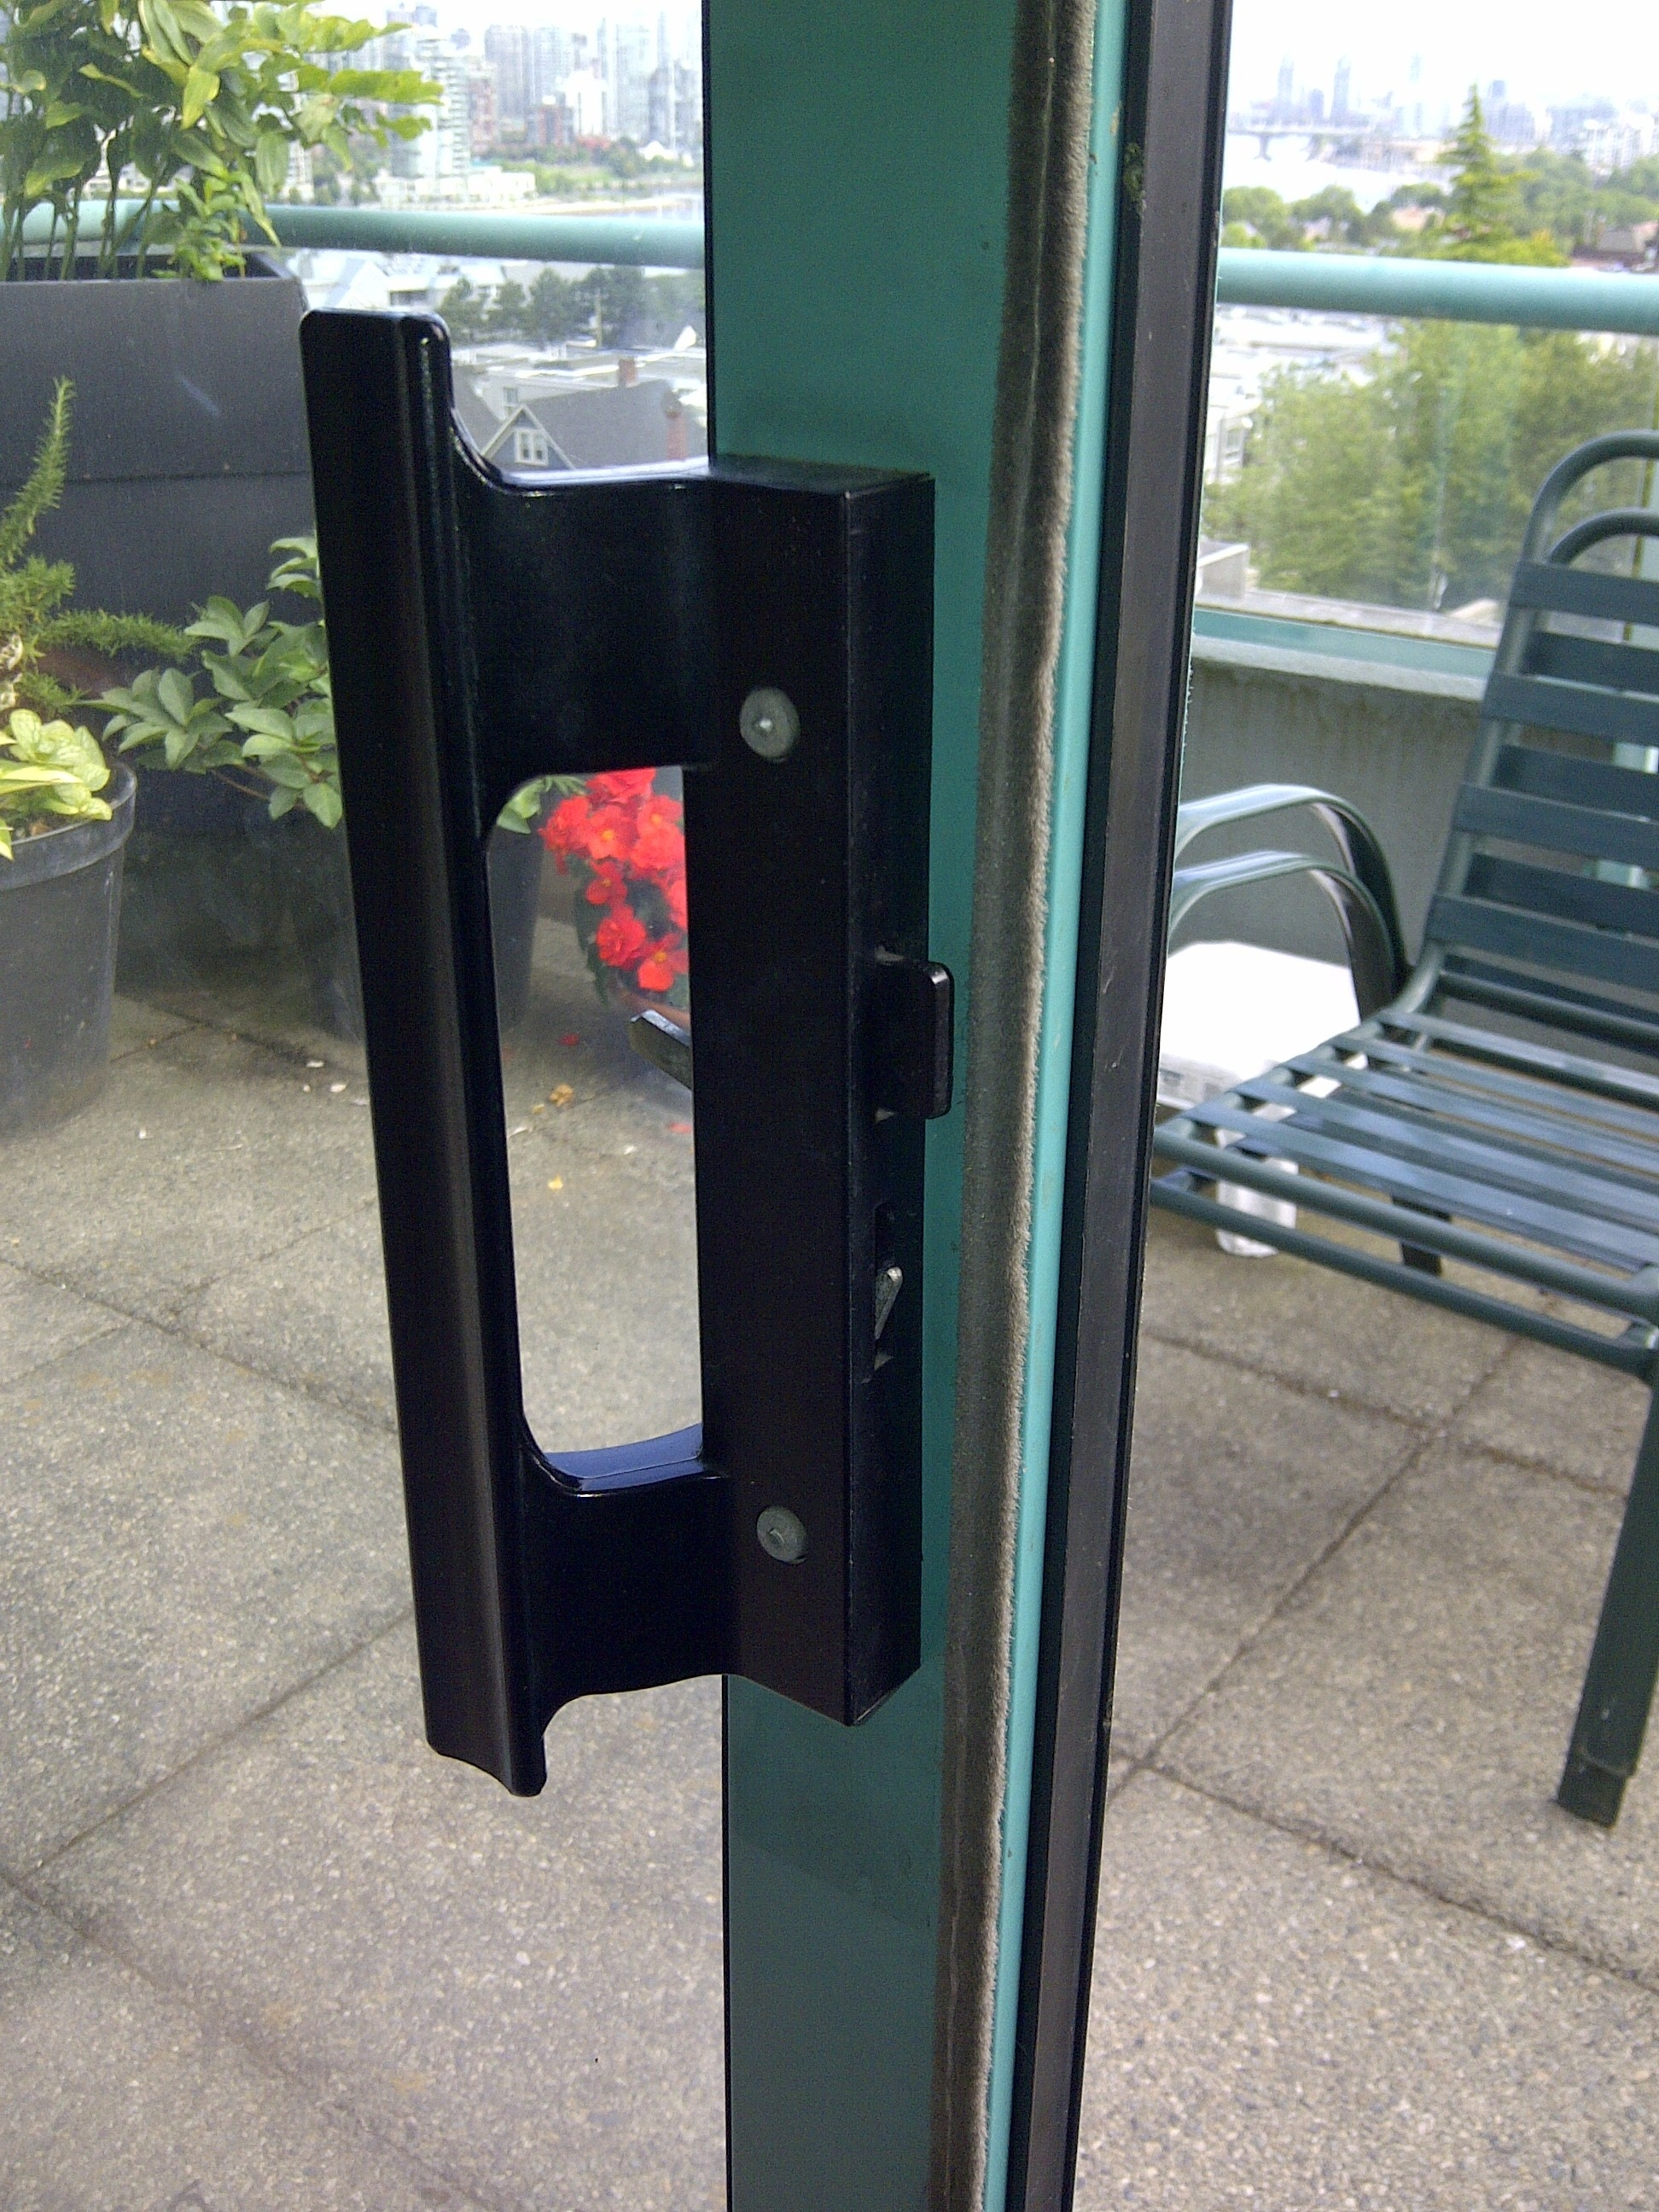 Aluminum Sliding Glass Patio Door Foot Lockglass doors replacement repair replace and install